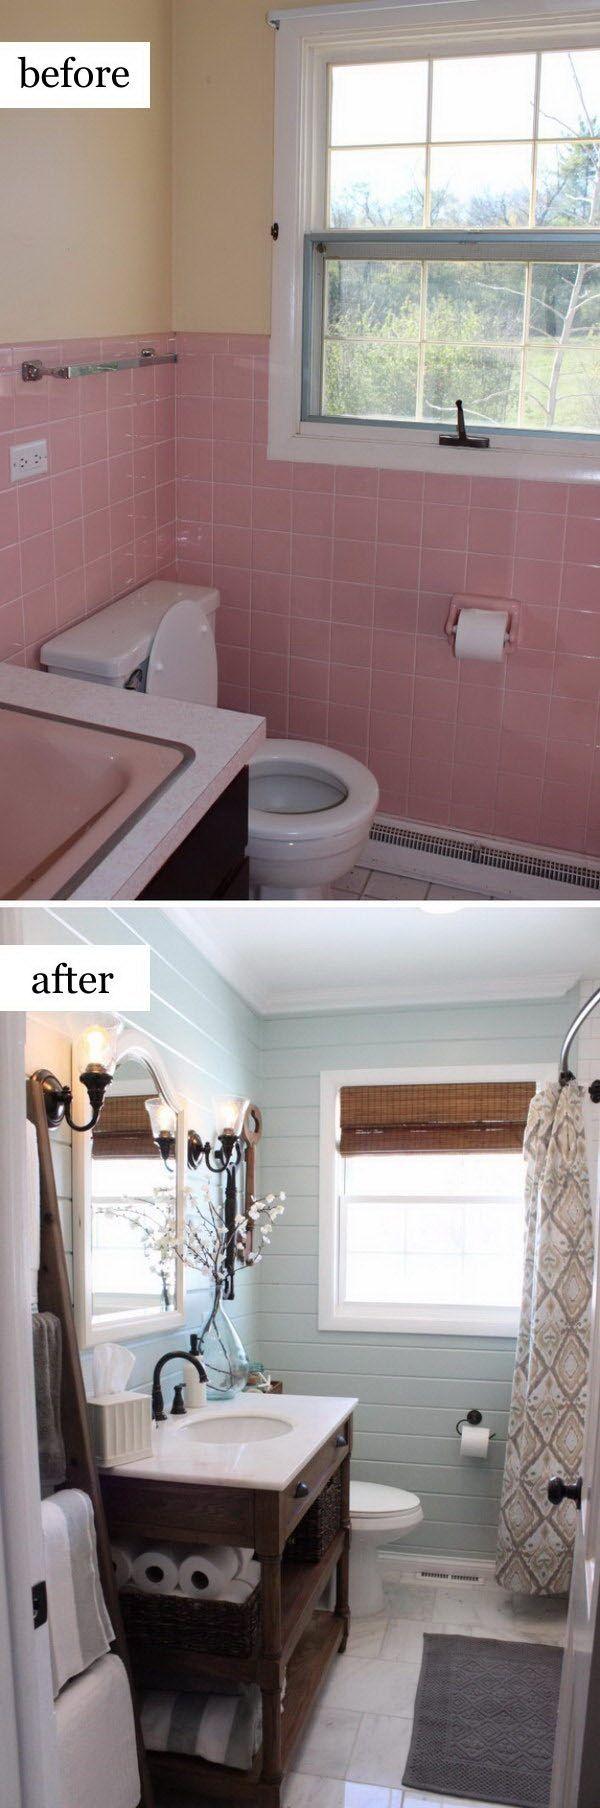 Best  Rustic Chic Bathrooms Ideas On Pinterest - Bathroom ideas rustic